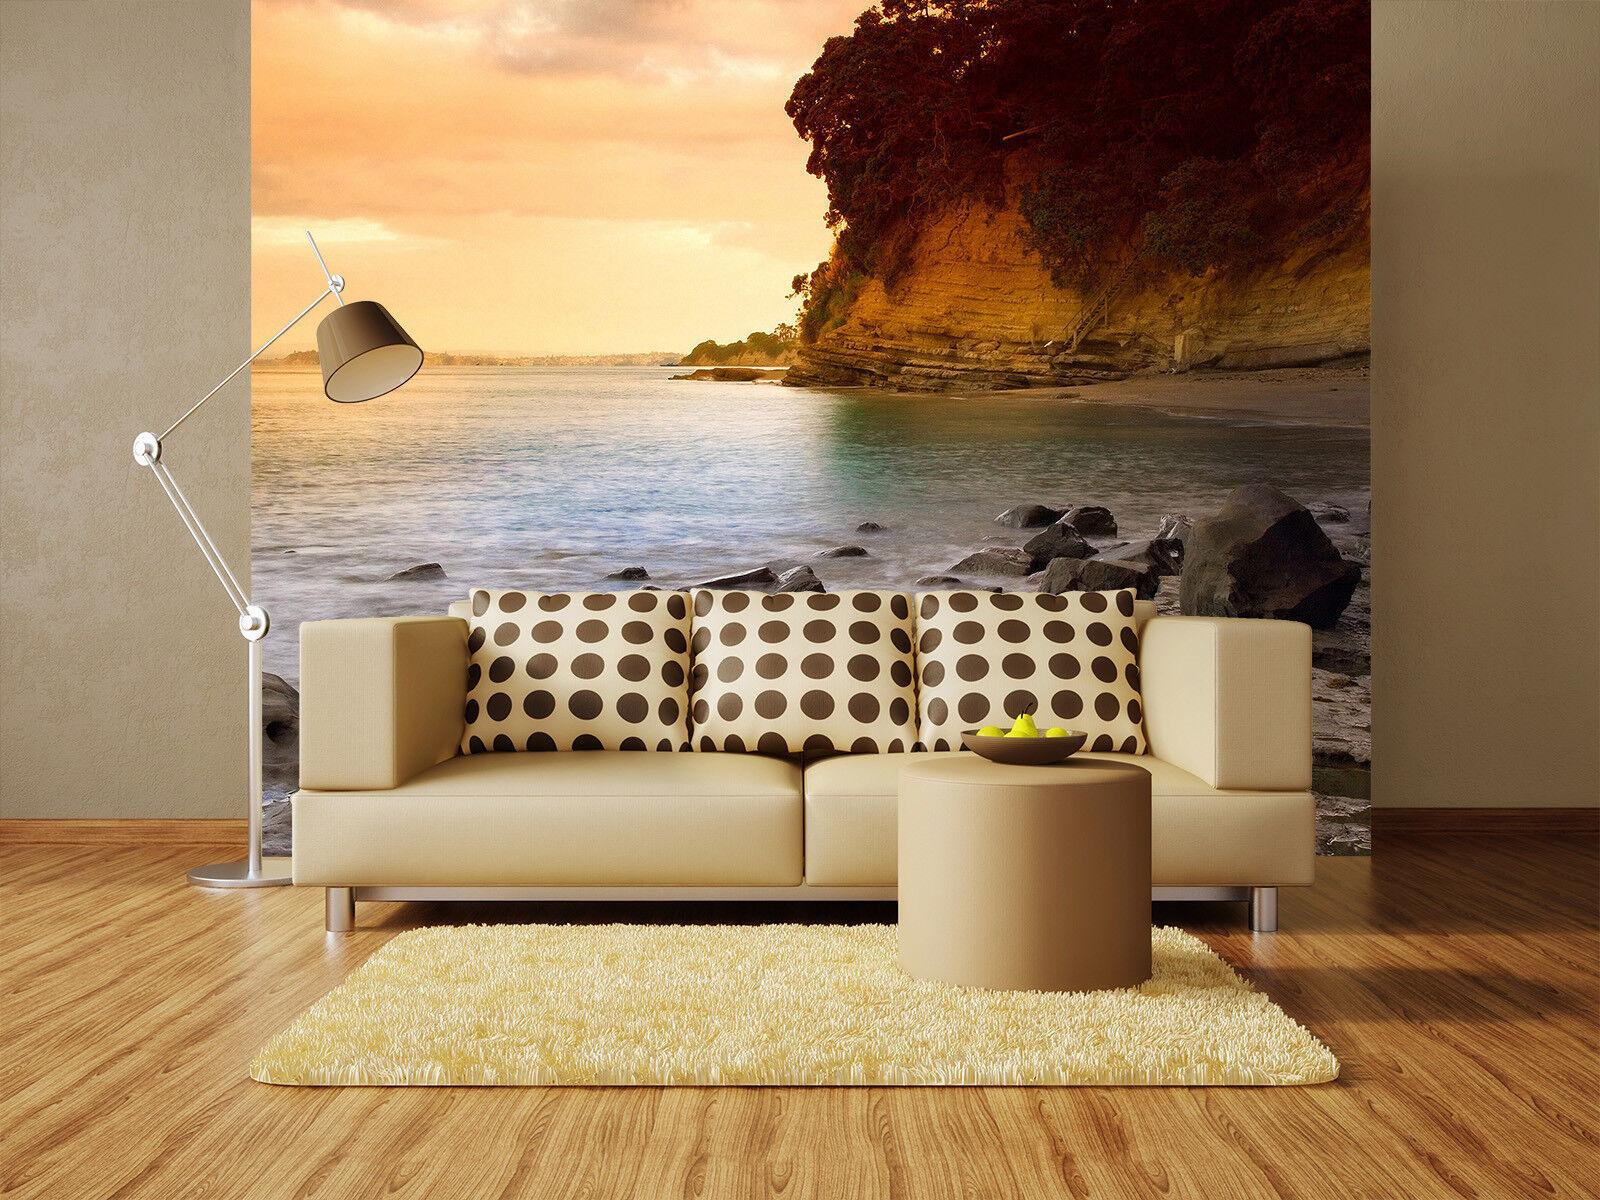 3D River Hills 521 Wallpaper Murals Wall Print Wallpaper Mural AJ WALL AU Kyra